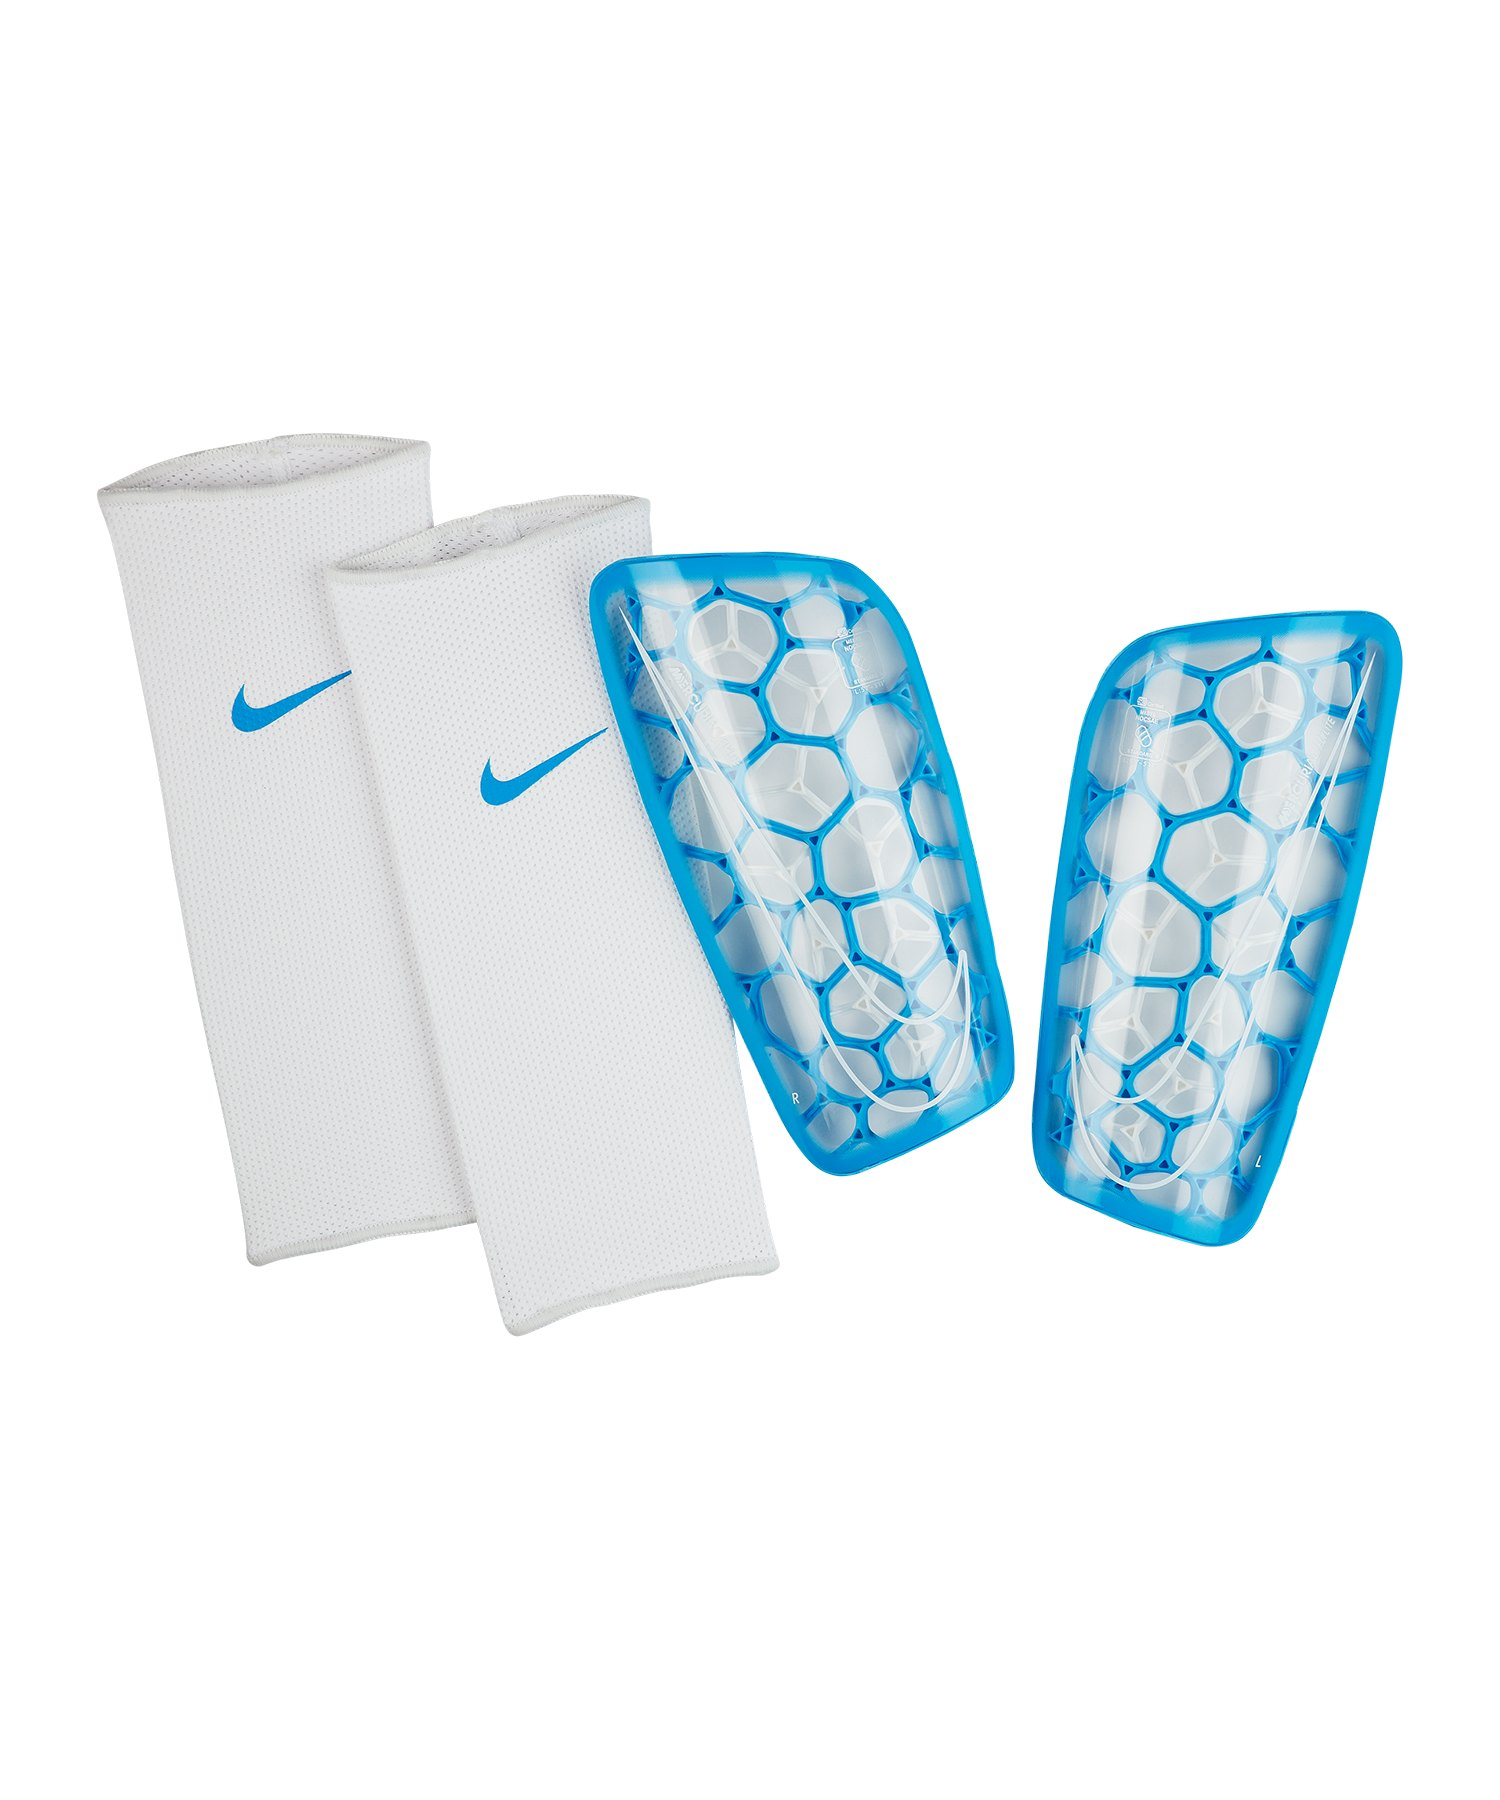 Nike Mercurial Flylite Superlock Schoner F486 - blau